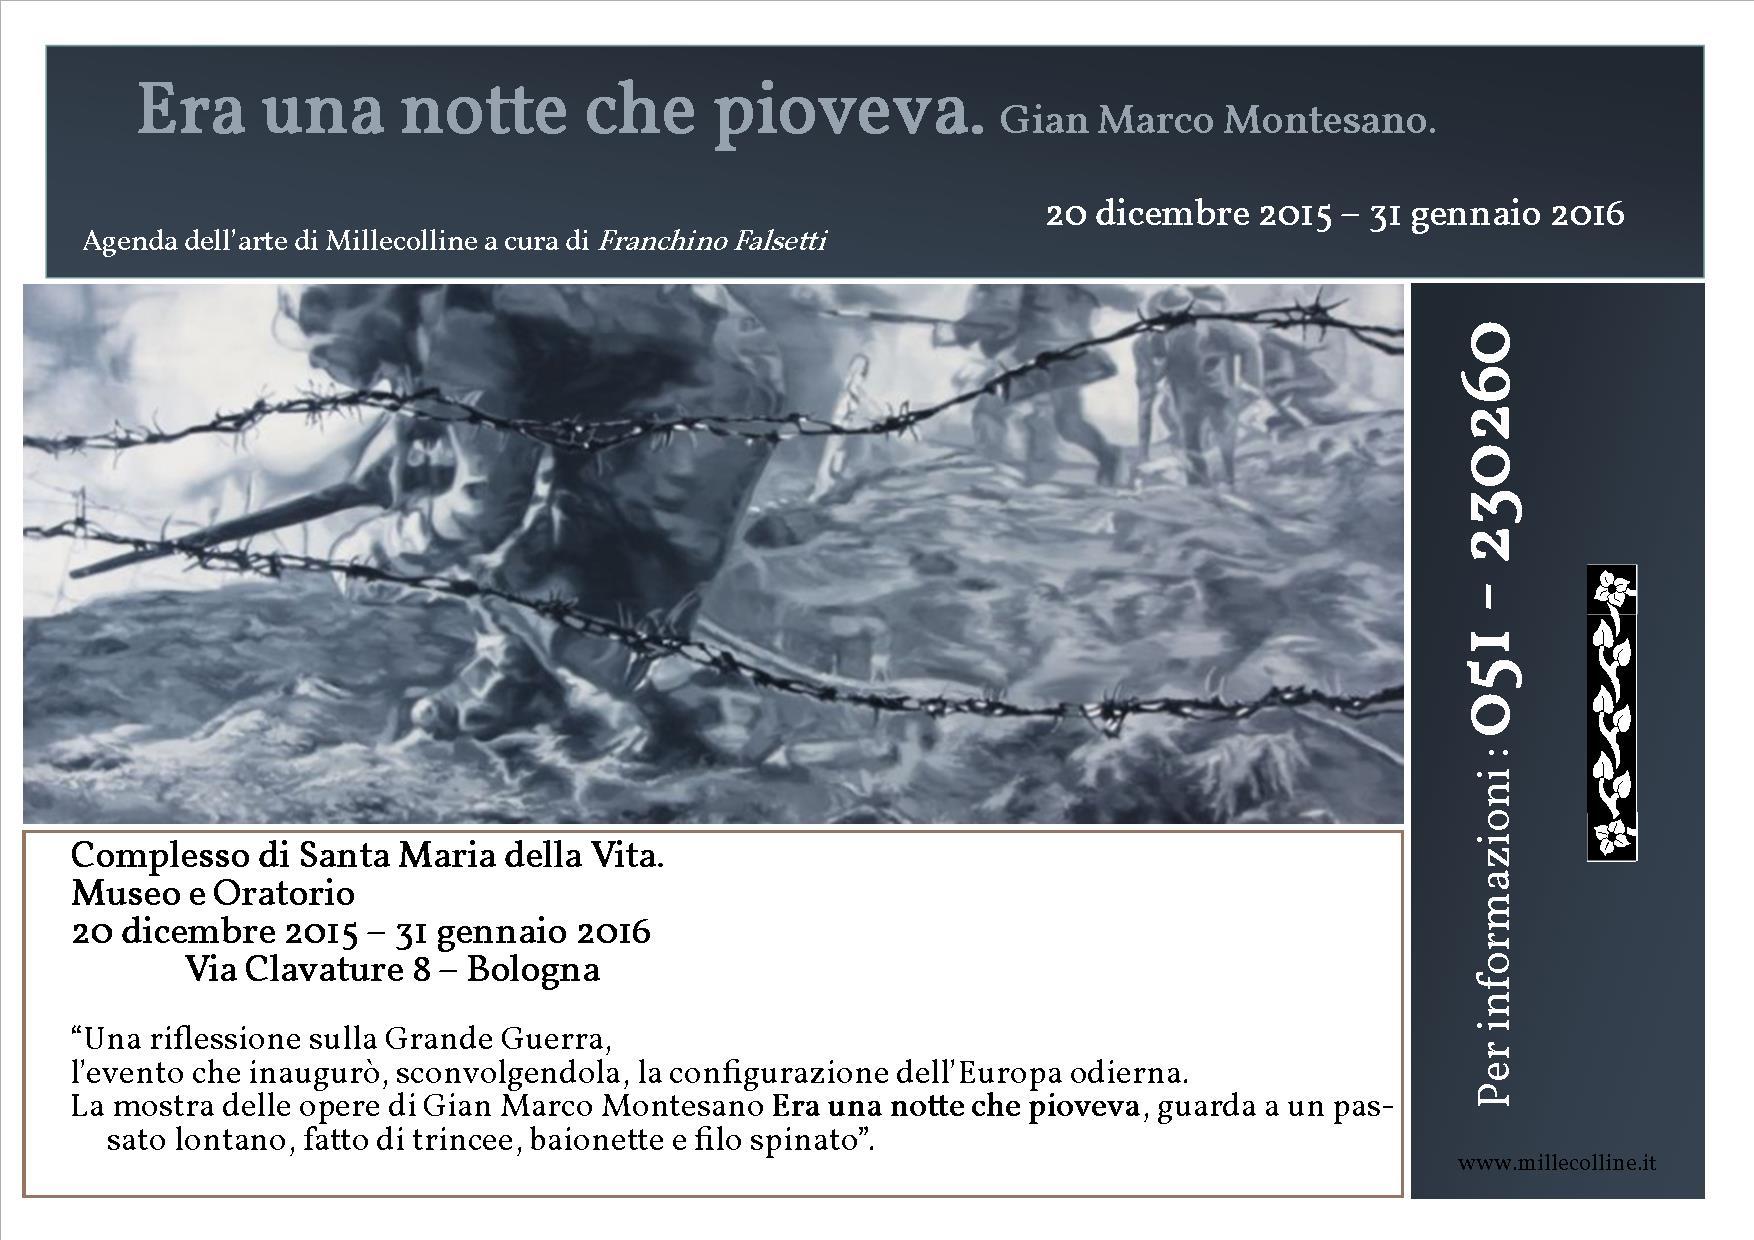 Agenda - Montesano